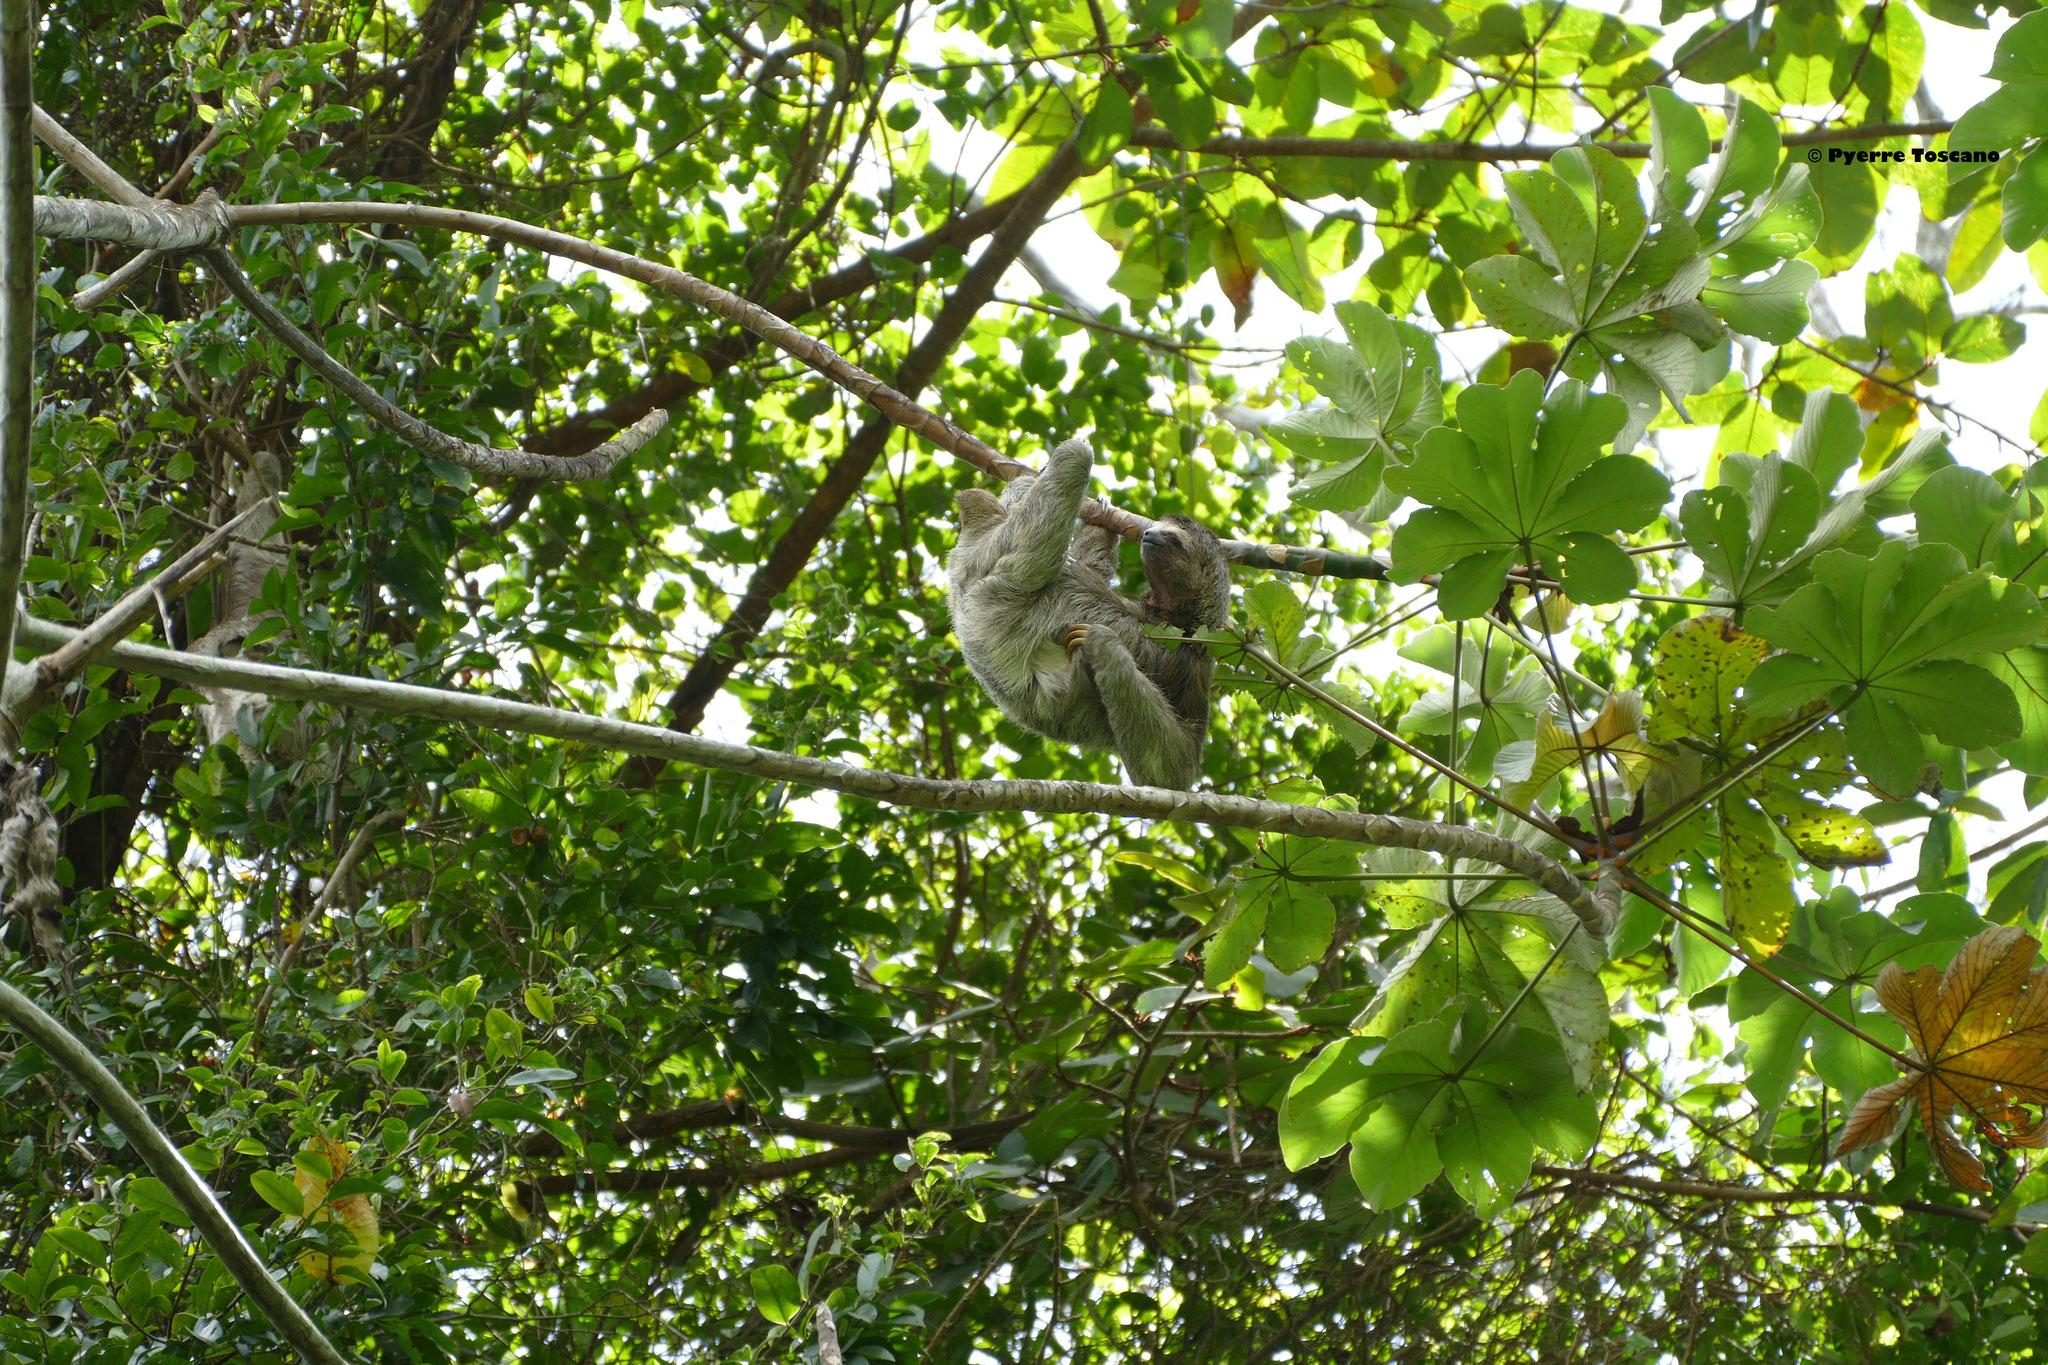 Bradyous variegatus